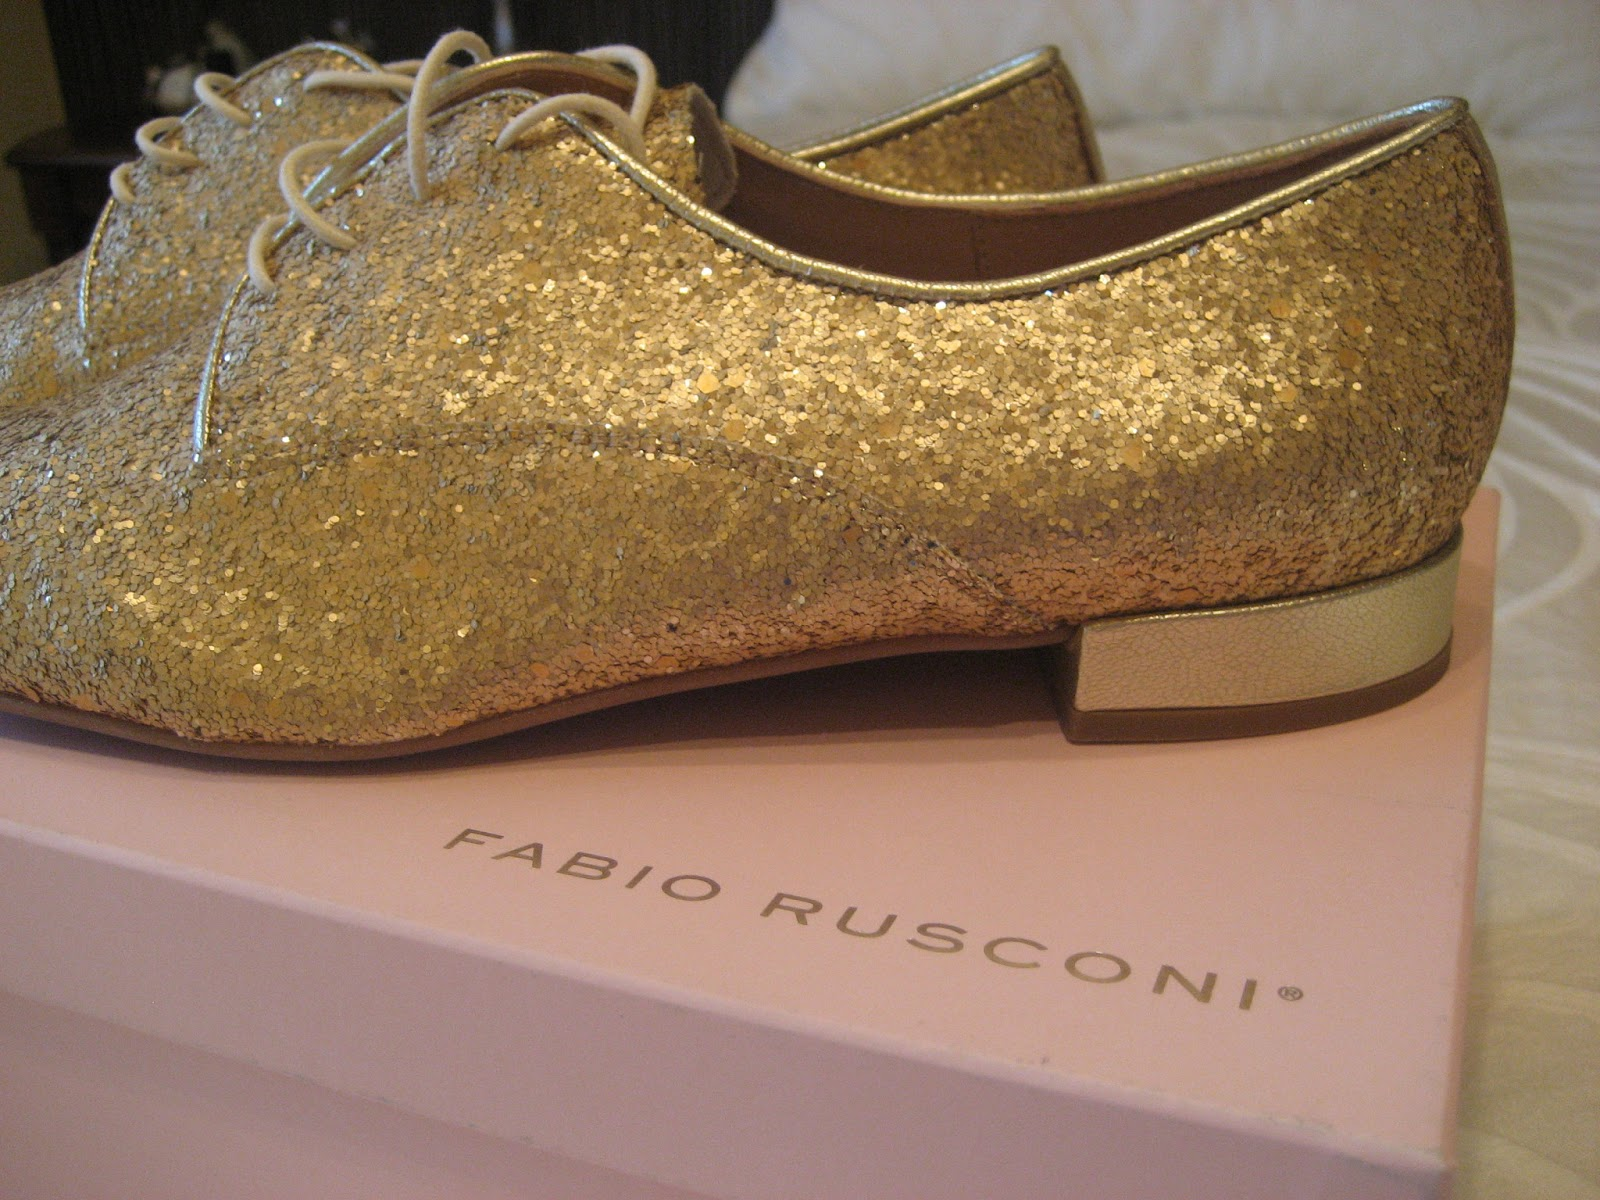 new in fabio rusconi shoes imelda y sus zapatos